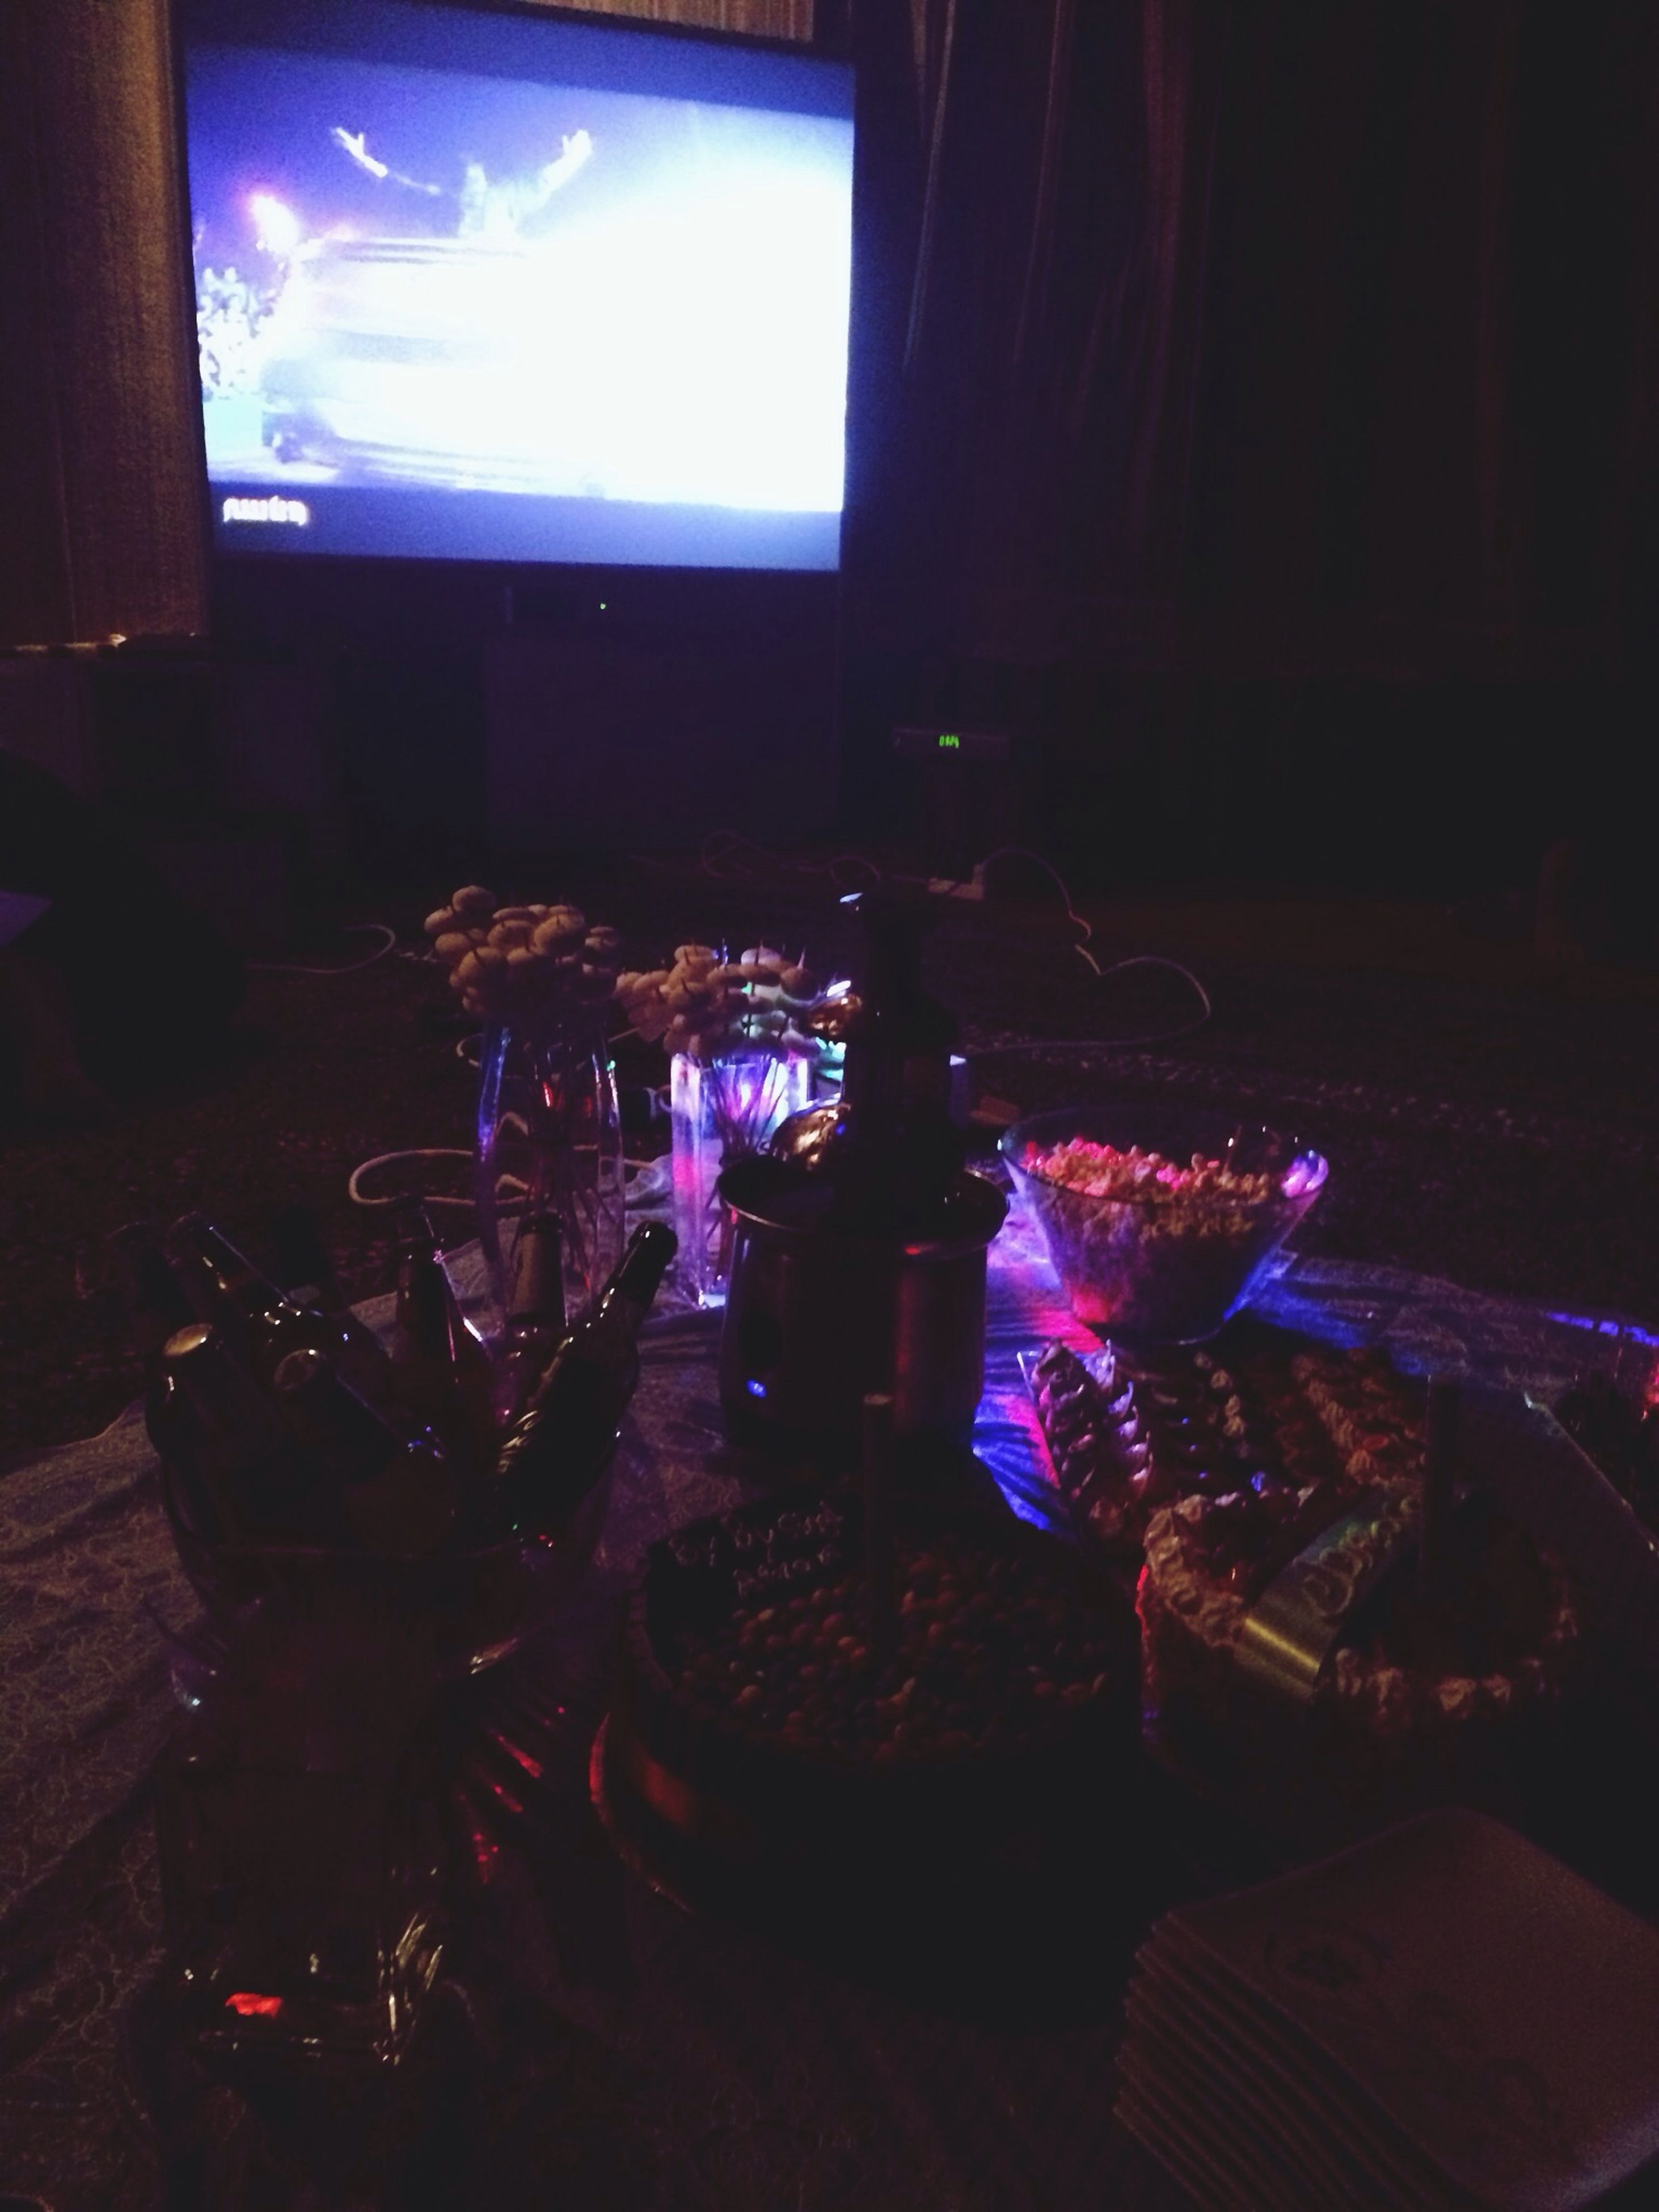 night, illuminated, indoors, dark, light - natural phenomenon, home interior, glowing, sitting, lighting equipment, sunlight, burning, shadow, purple, auto post production filter, celebration, relaxation, fire - natural phenomenon, room